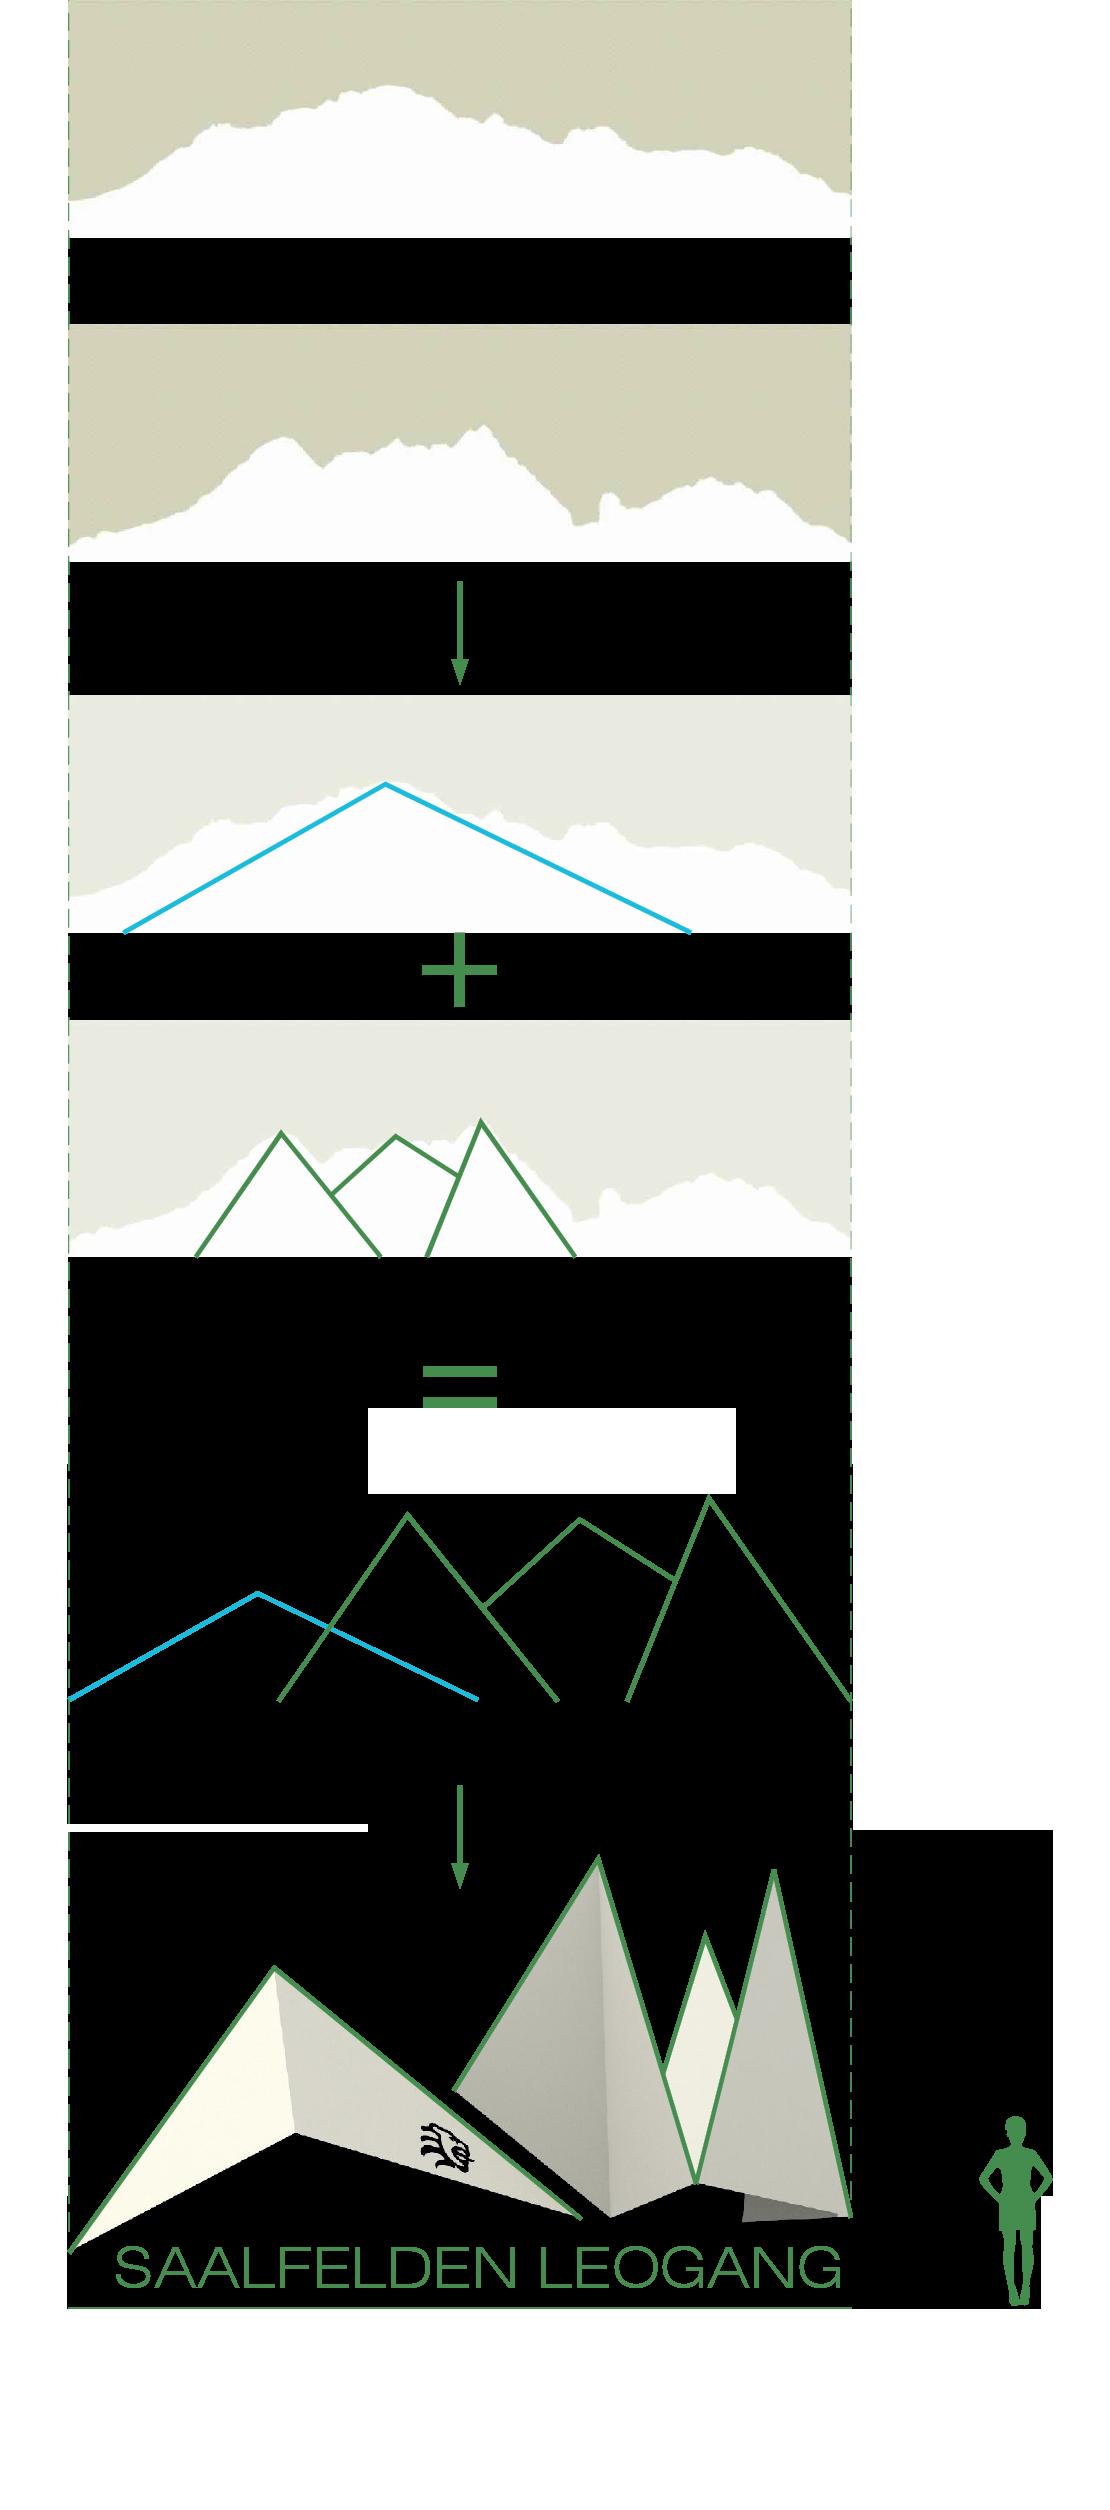 067_15 C_stoaberg_x-diagramm_1